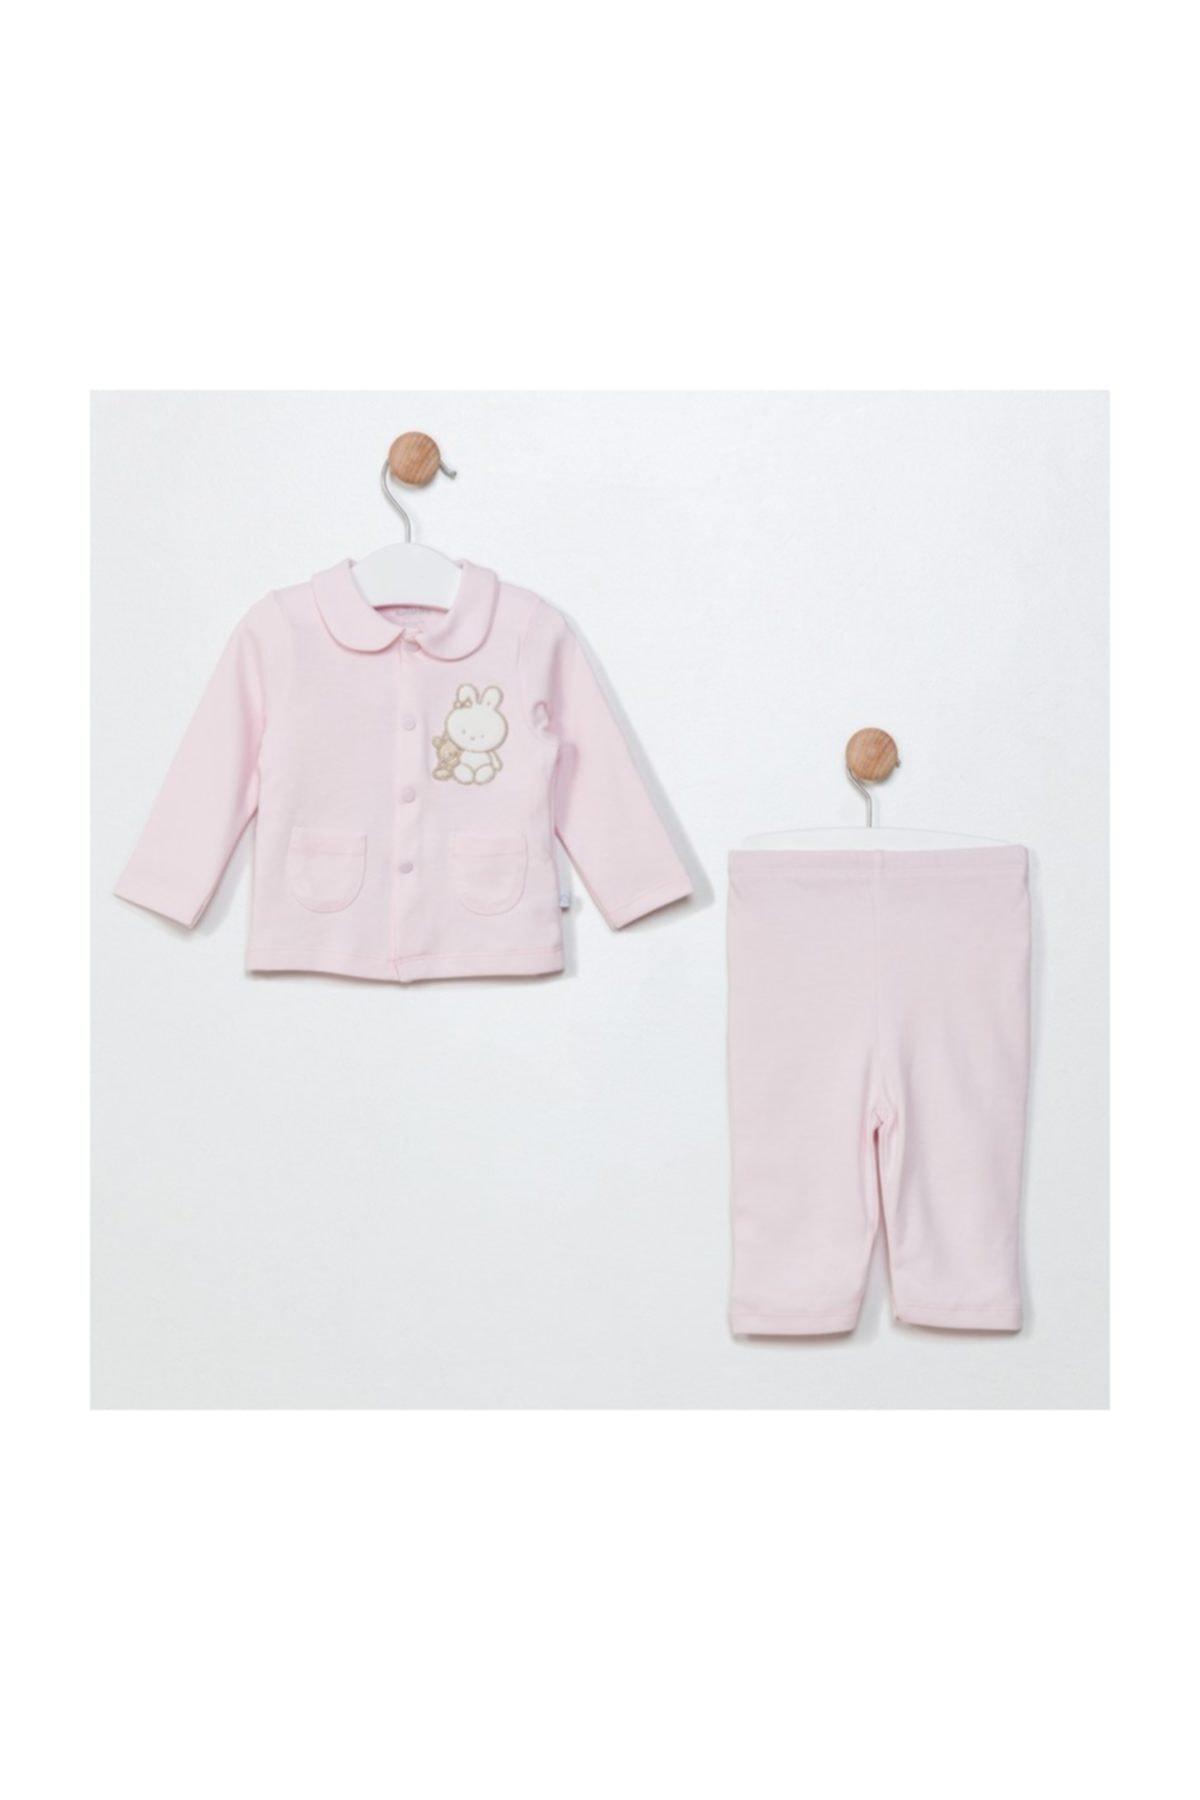 Funna Baby Ceket Pantolon - Grande Famiglia - Pembe 1